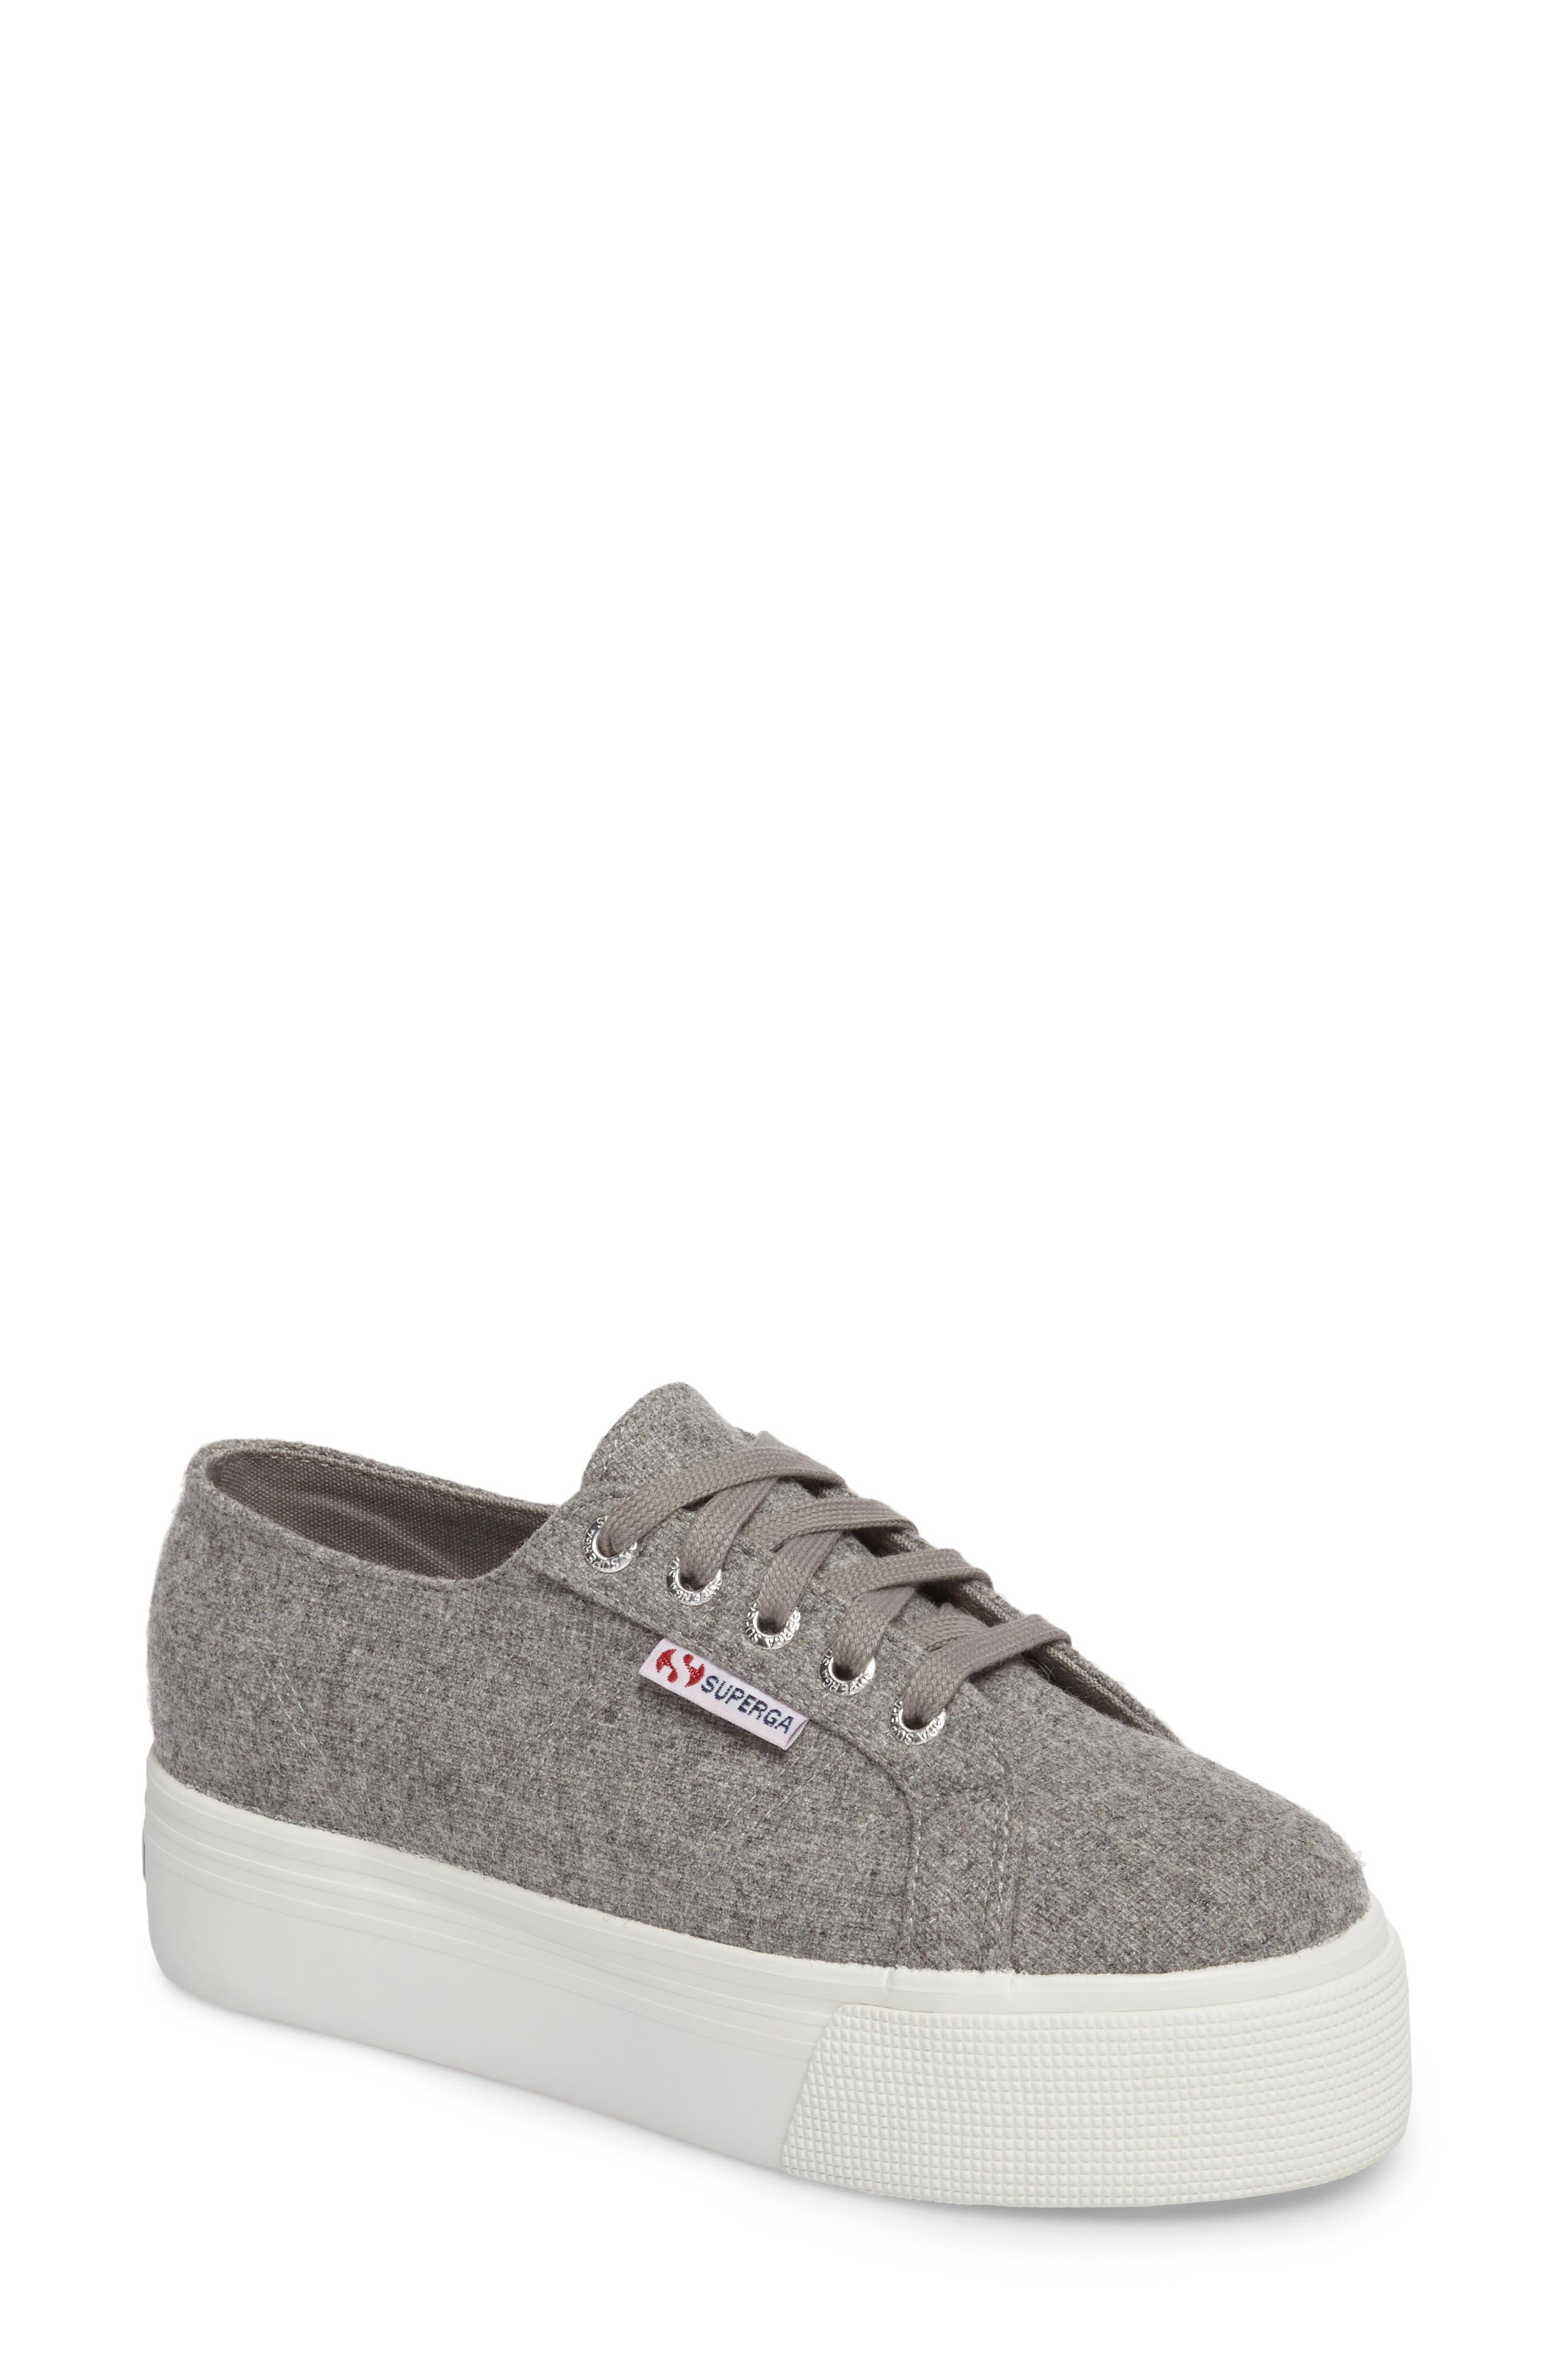 2790 Platform Sneaker,                         Main,                         color, Light Grey Canvas